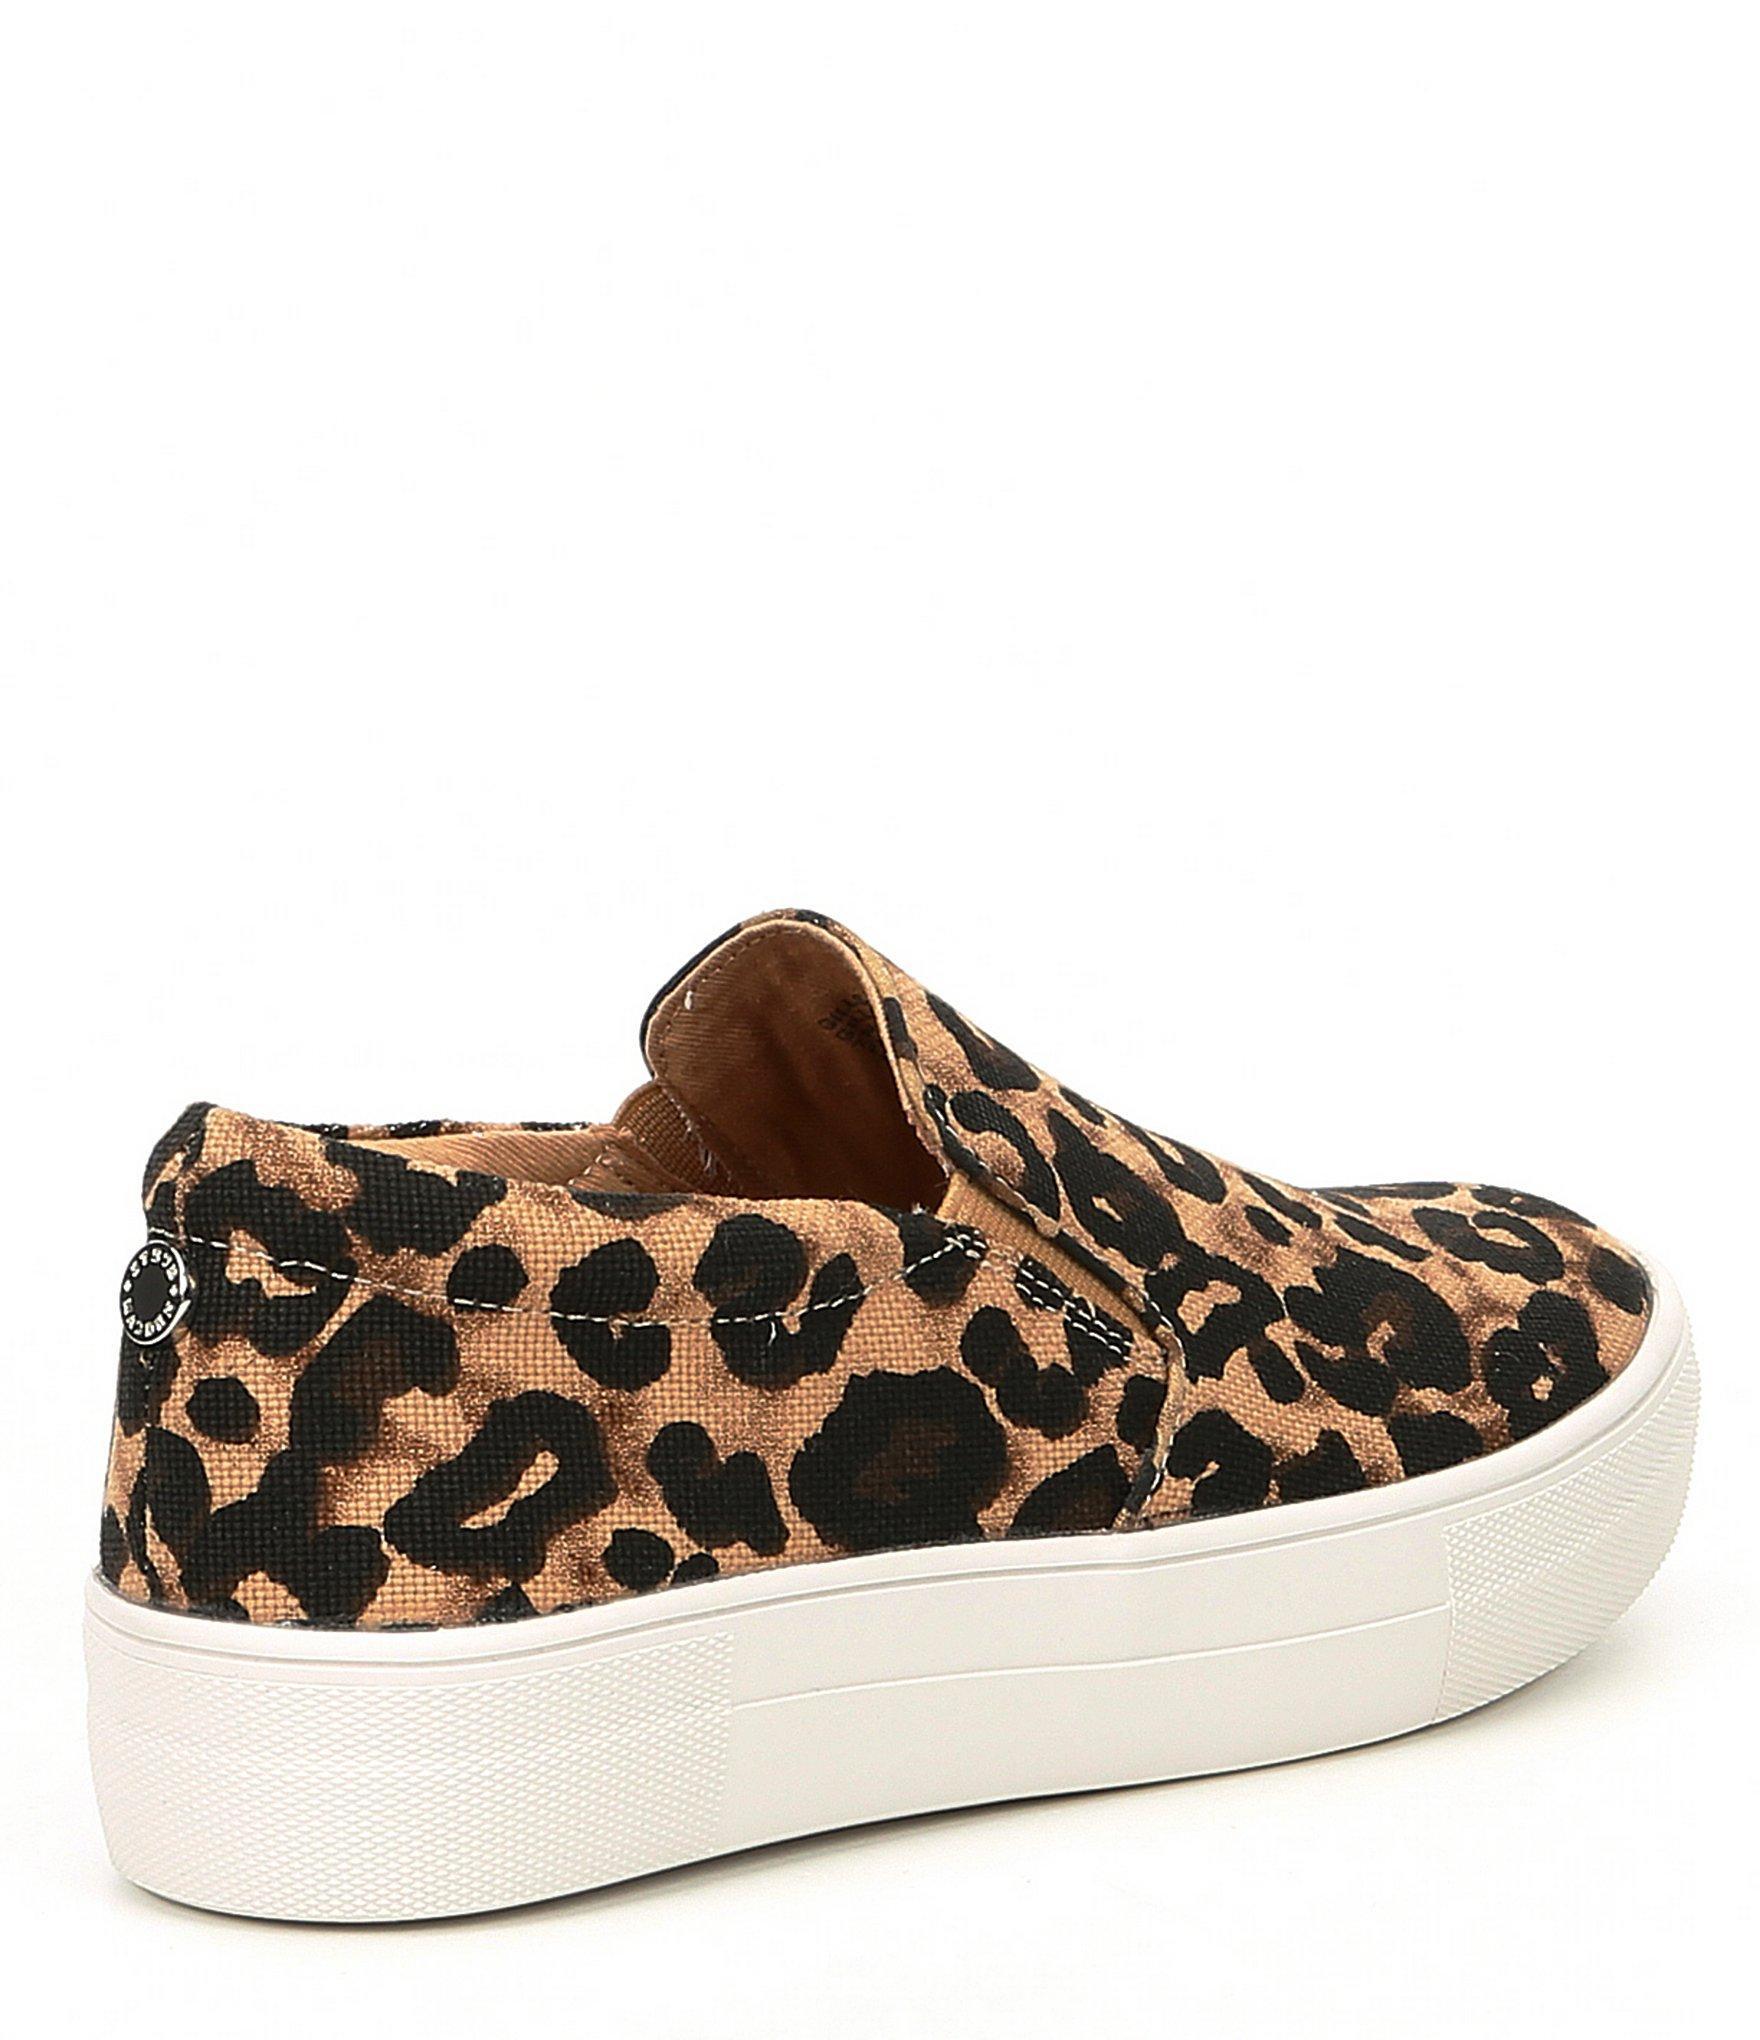 b5b5194f9cd Women's Brown Gills Leopard Print Platform Sneakers